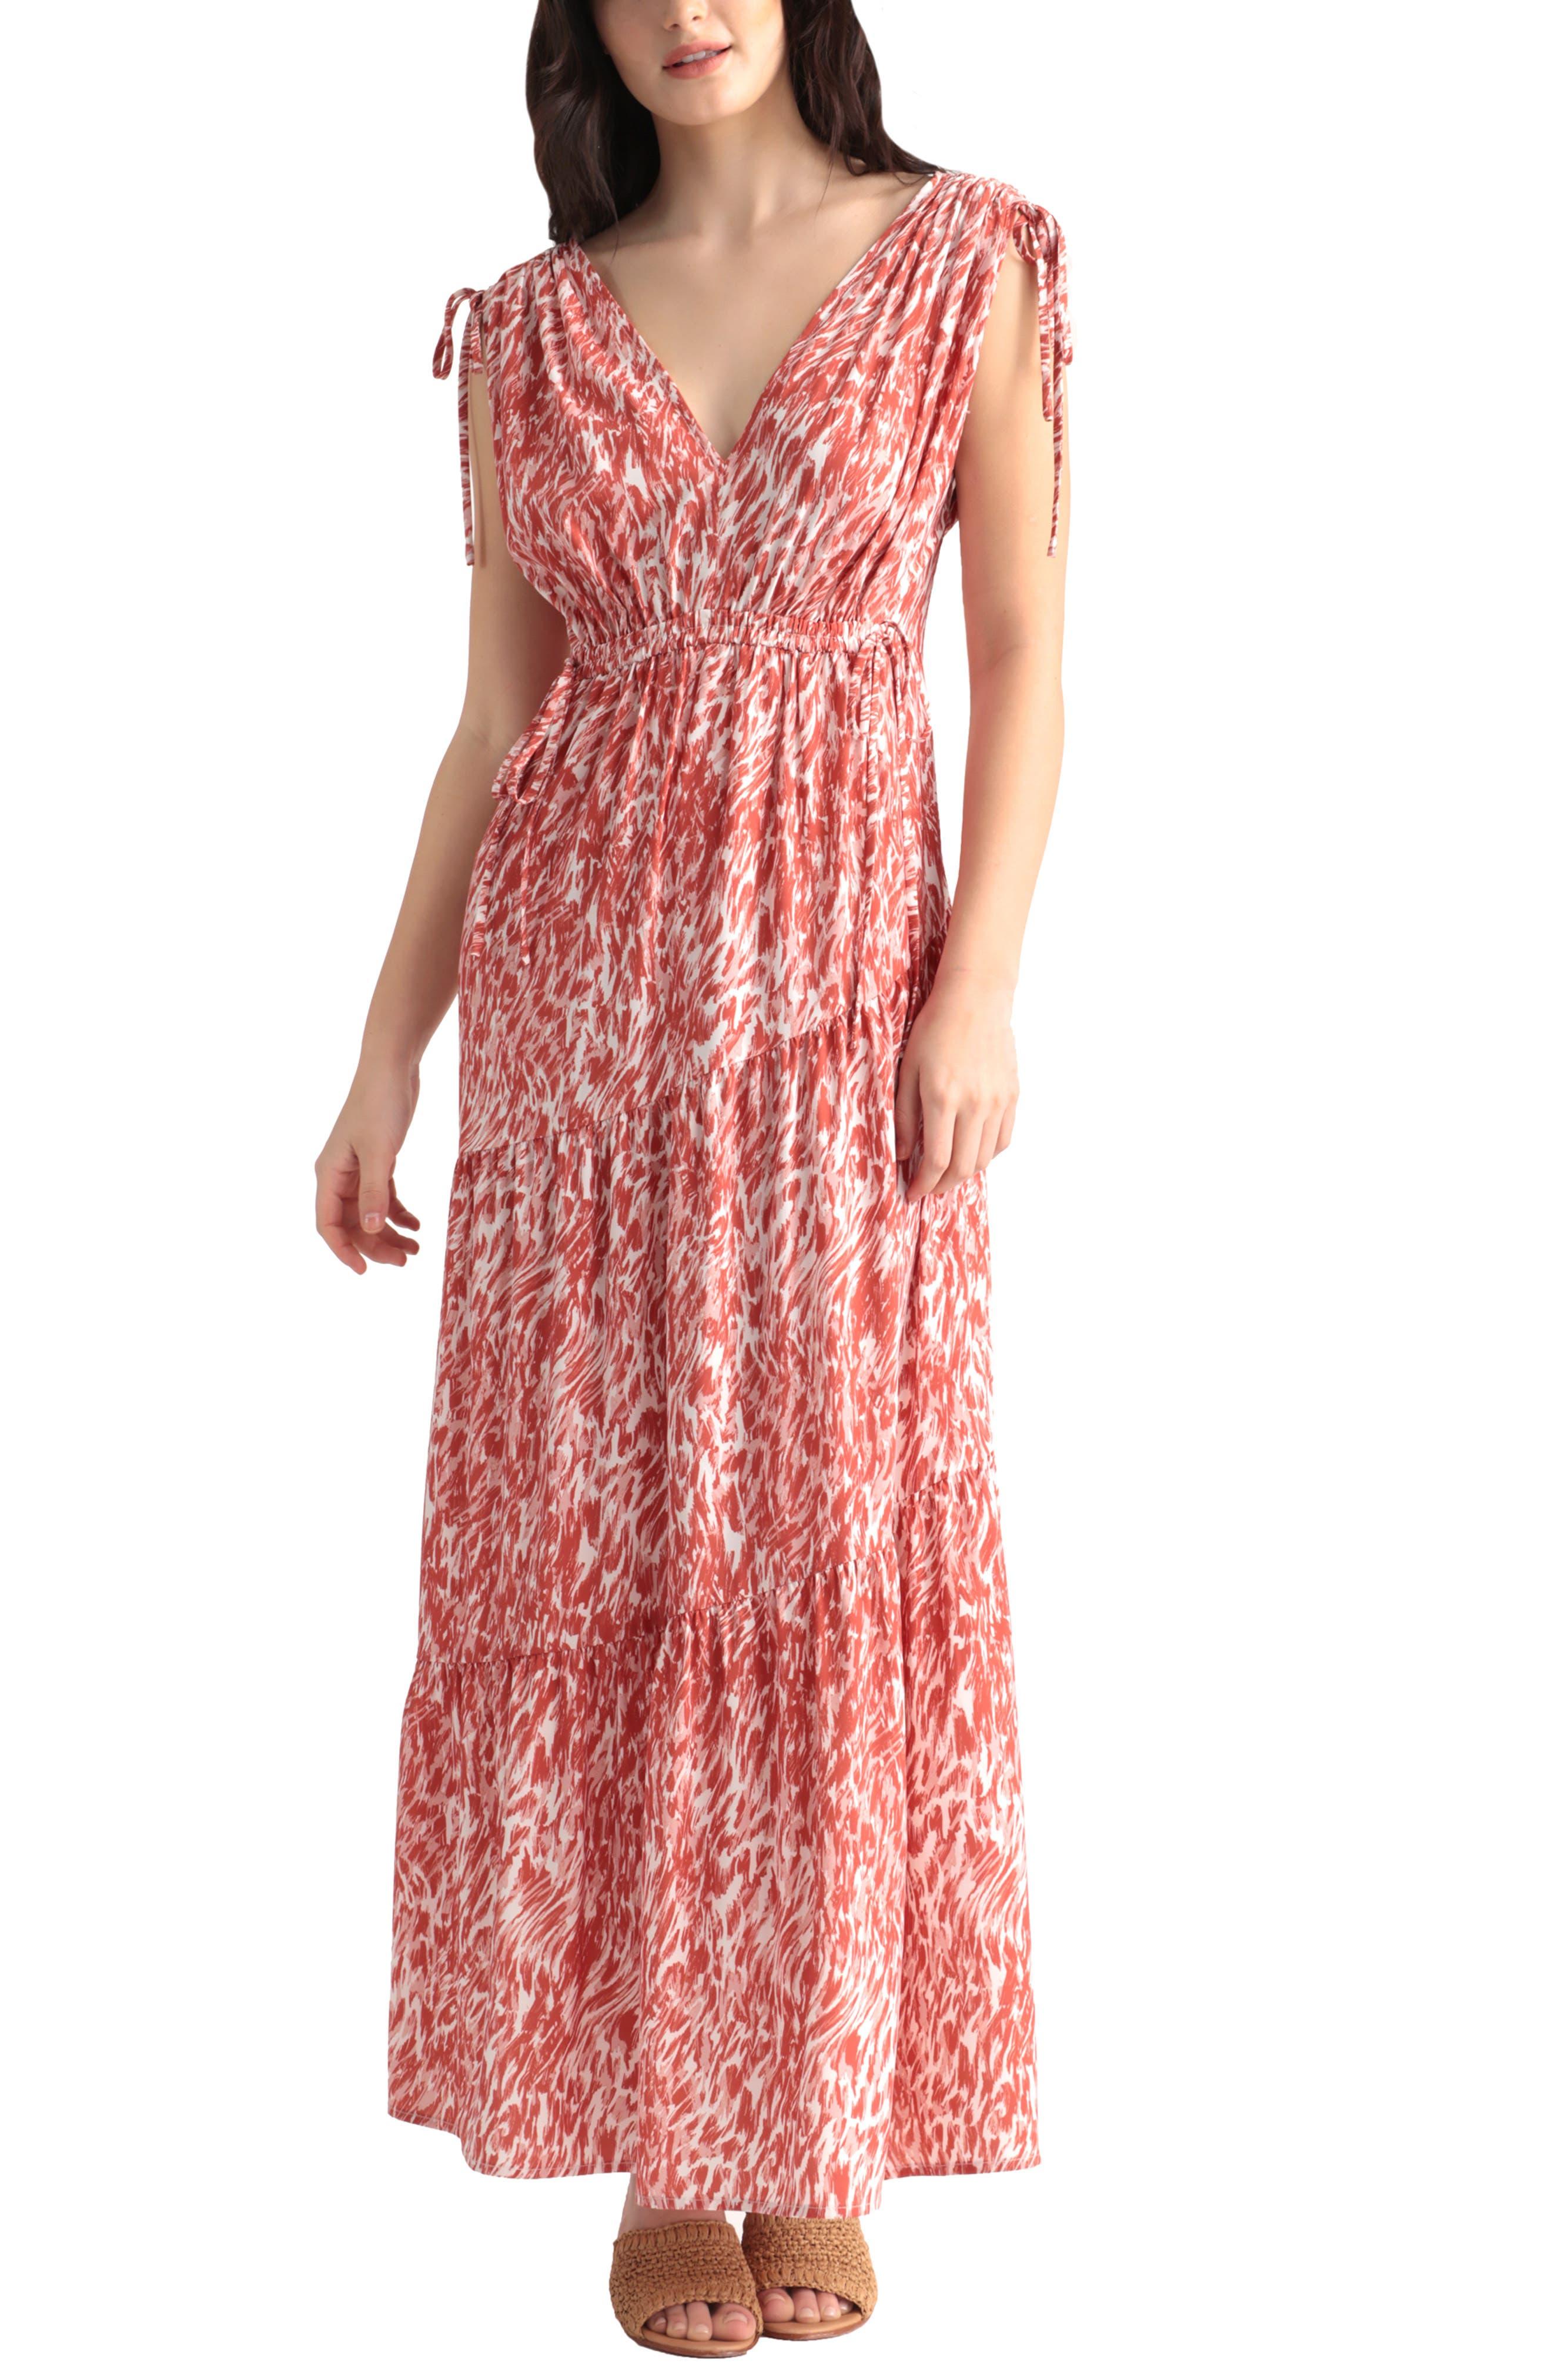 Abstract Swirl Print Tie Sleeve Dress